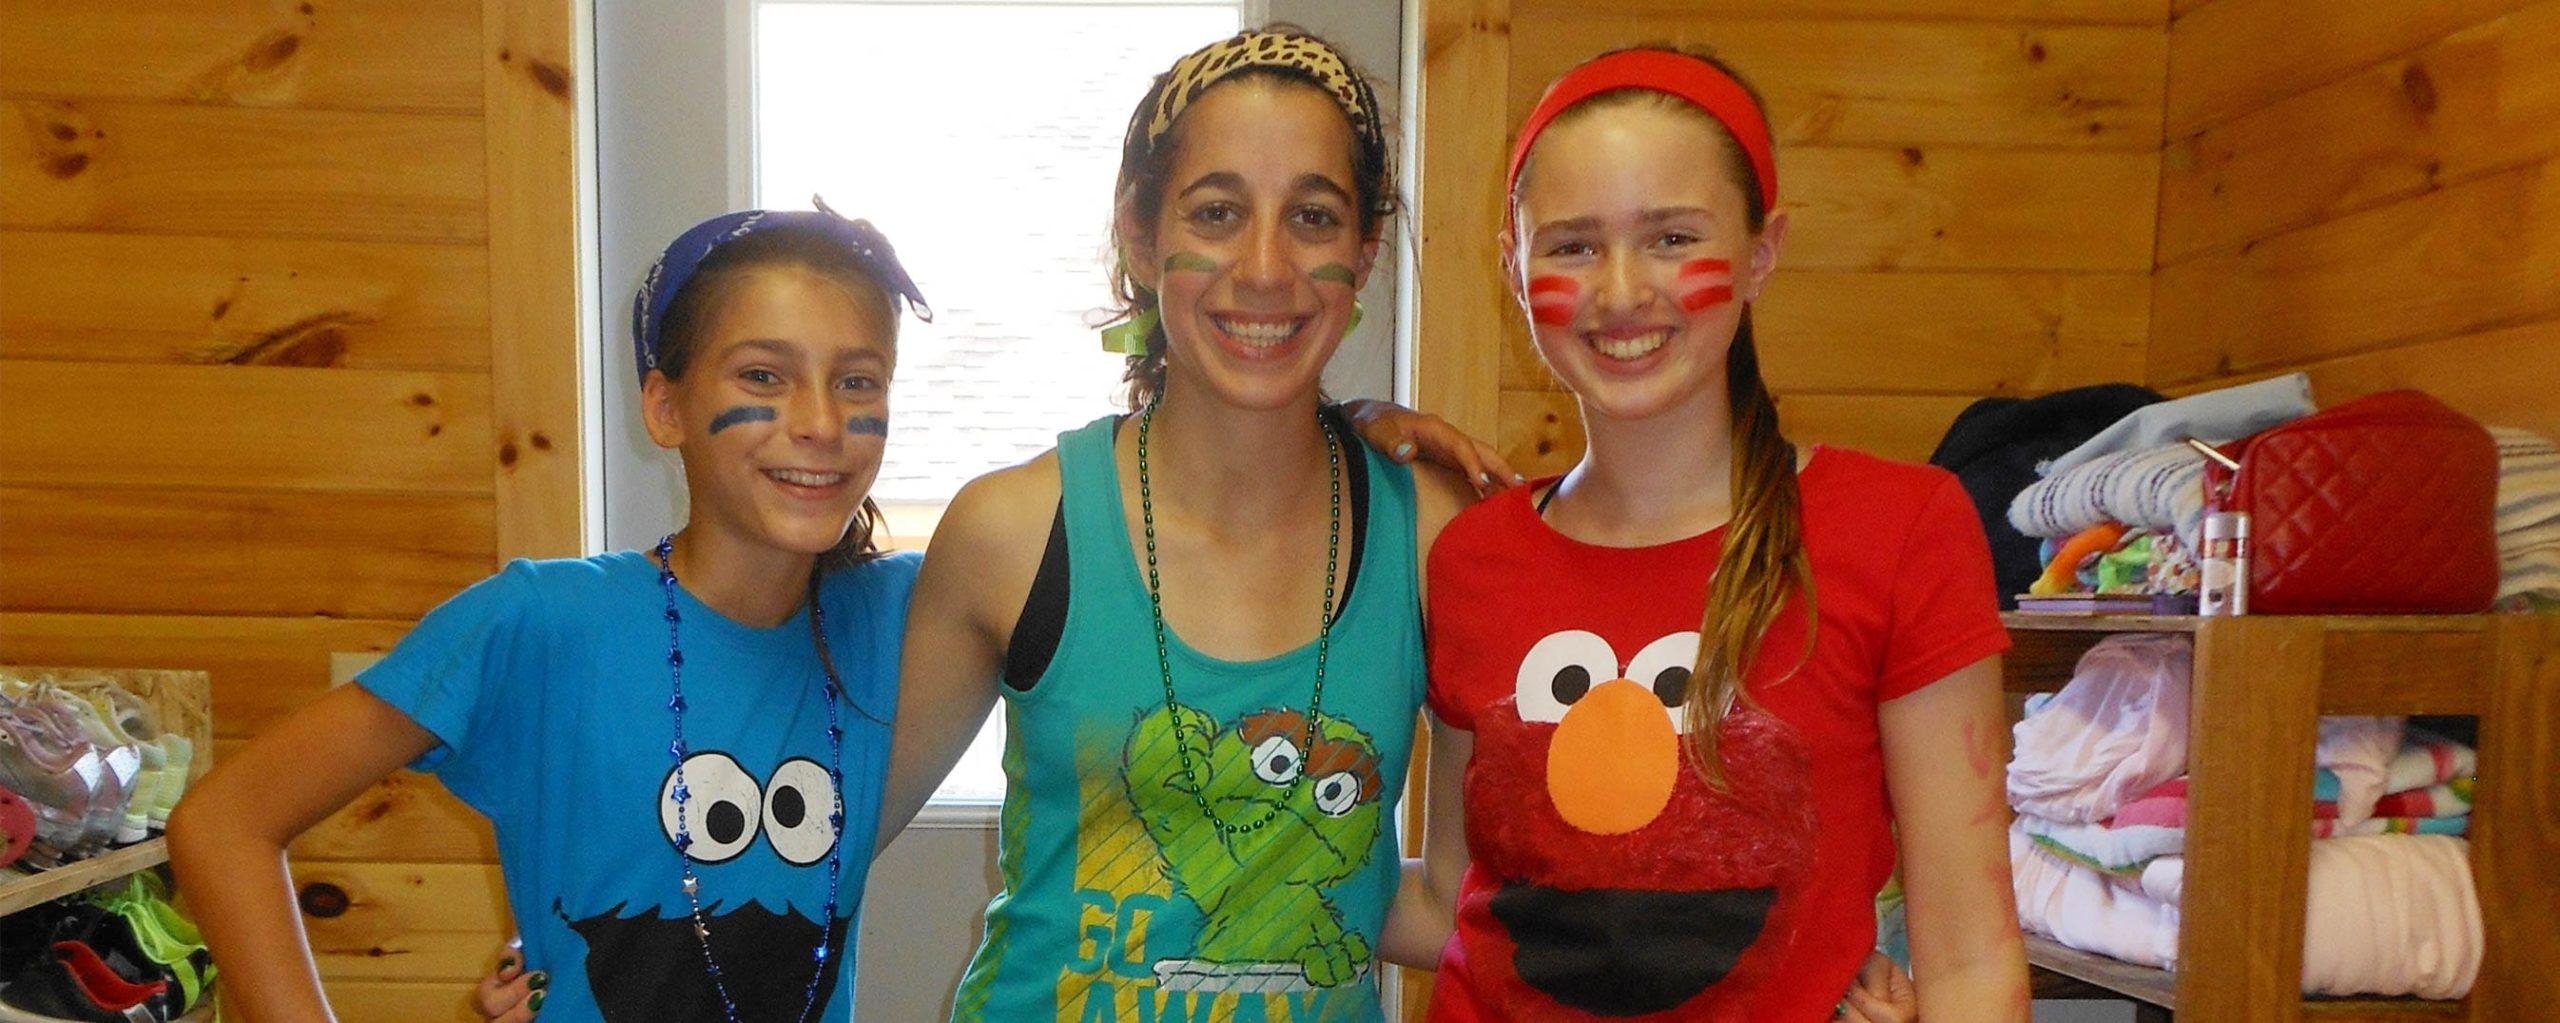 three female campers